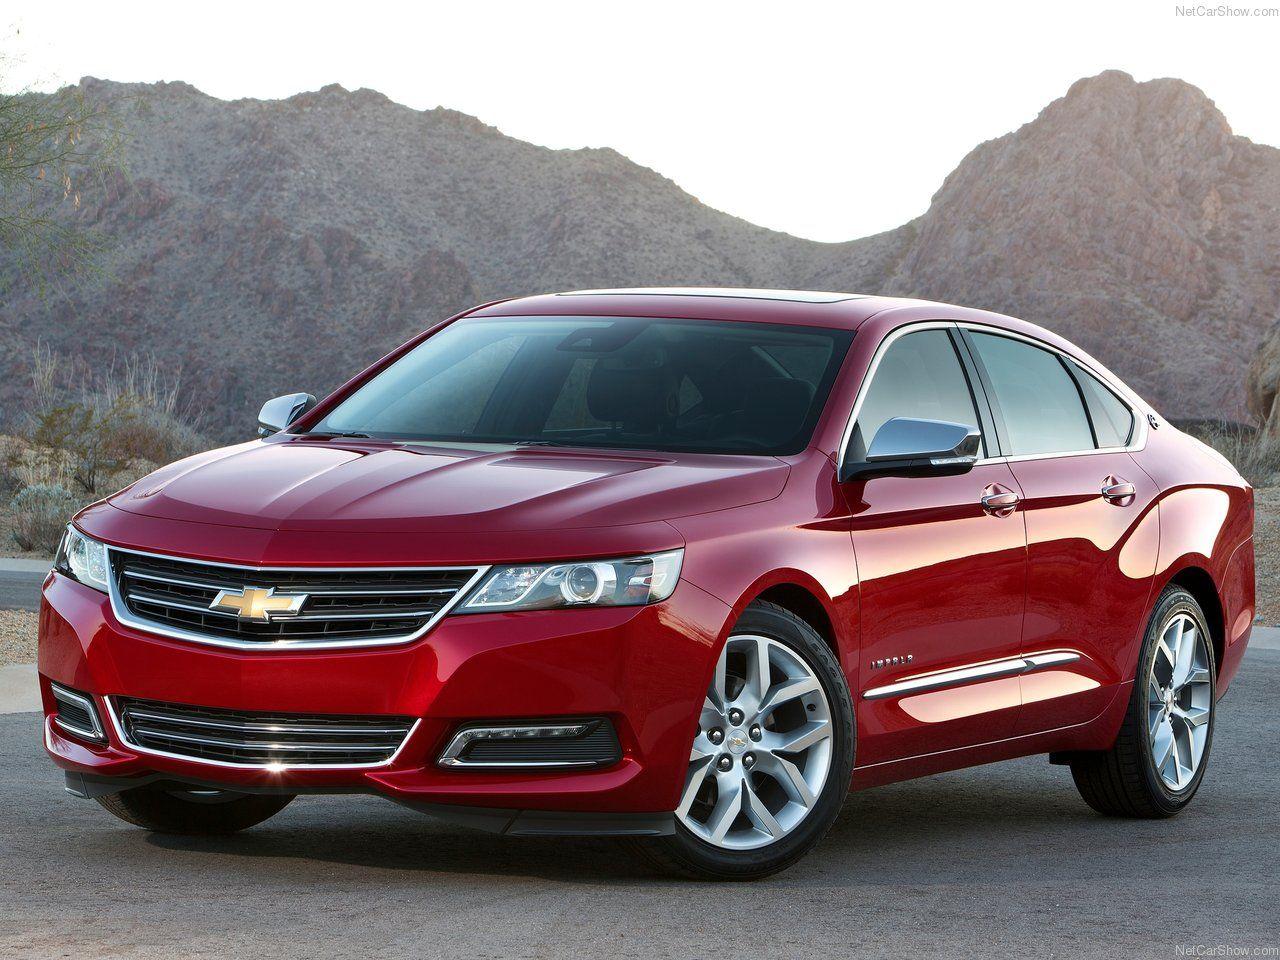 Chevrolet Impala cars Pinterest